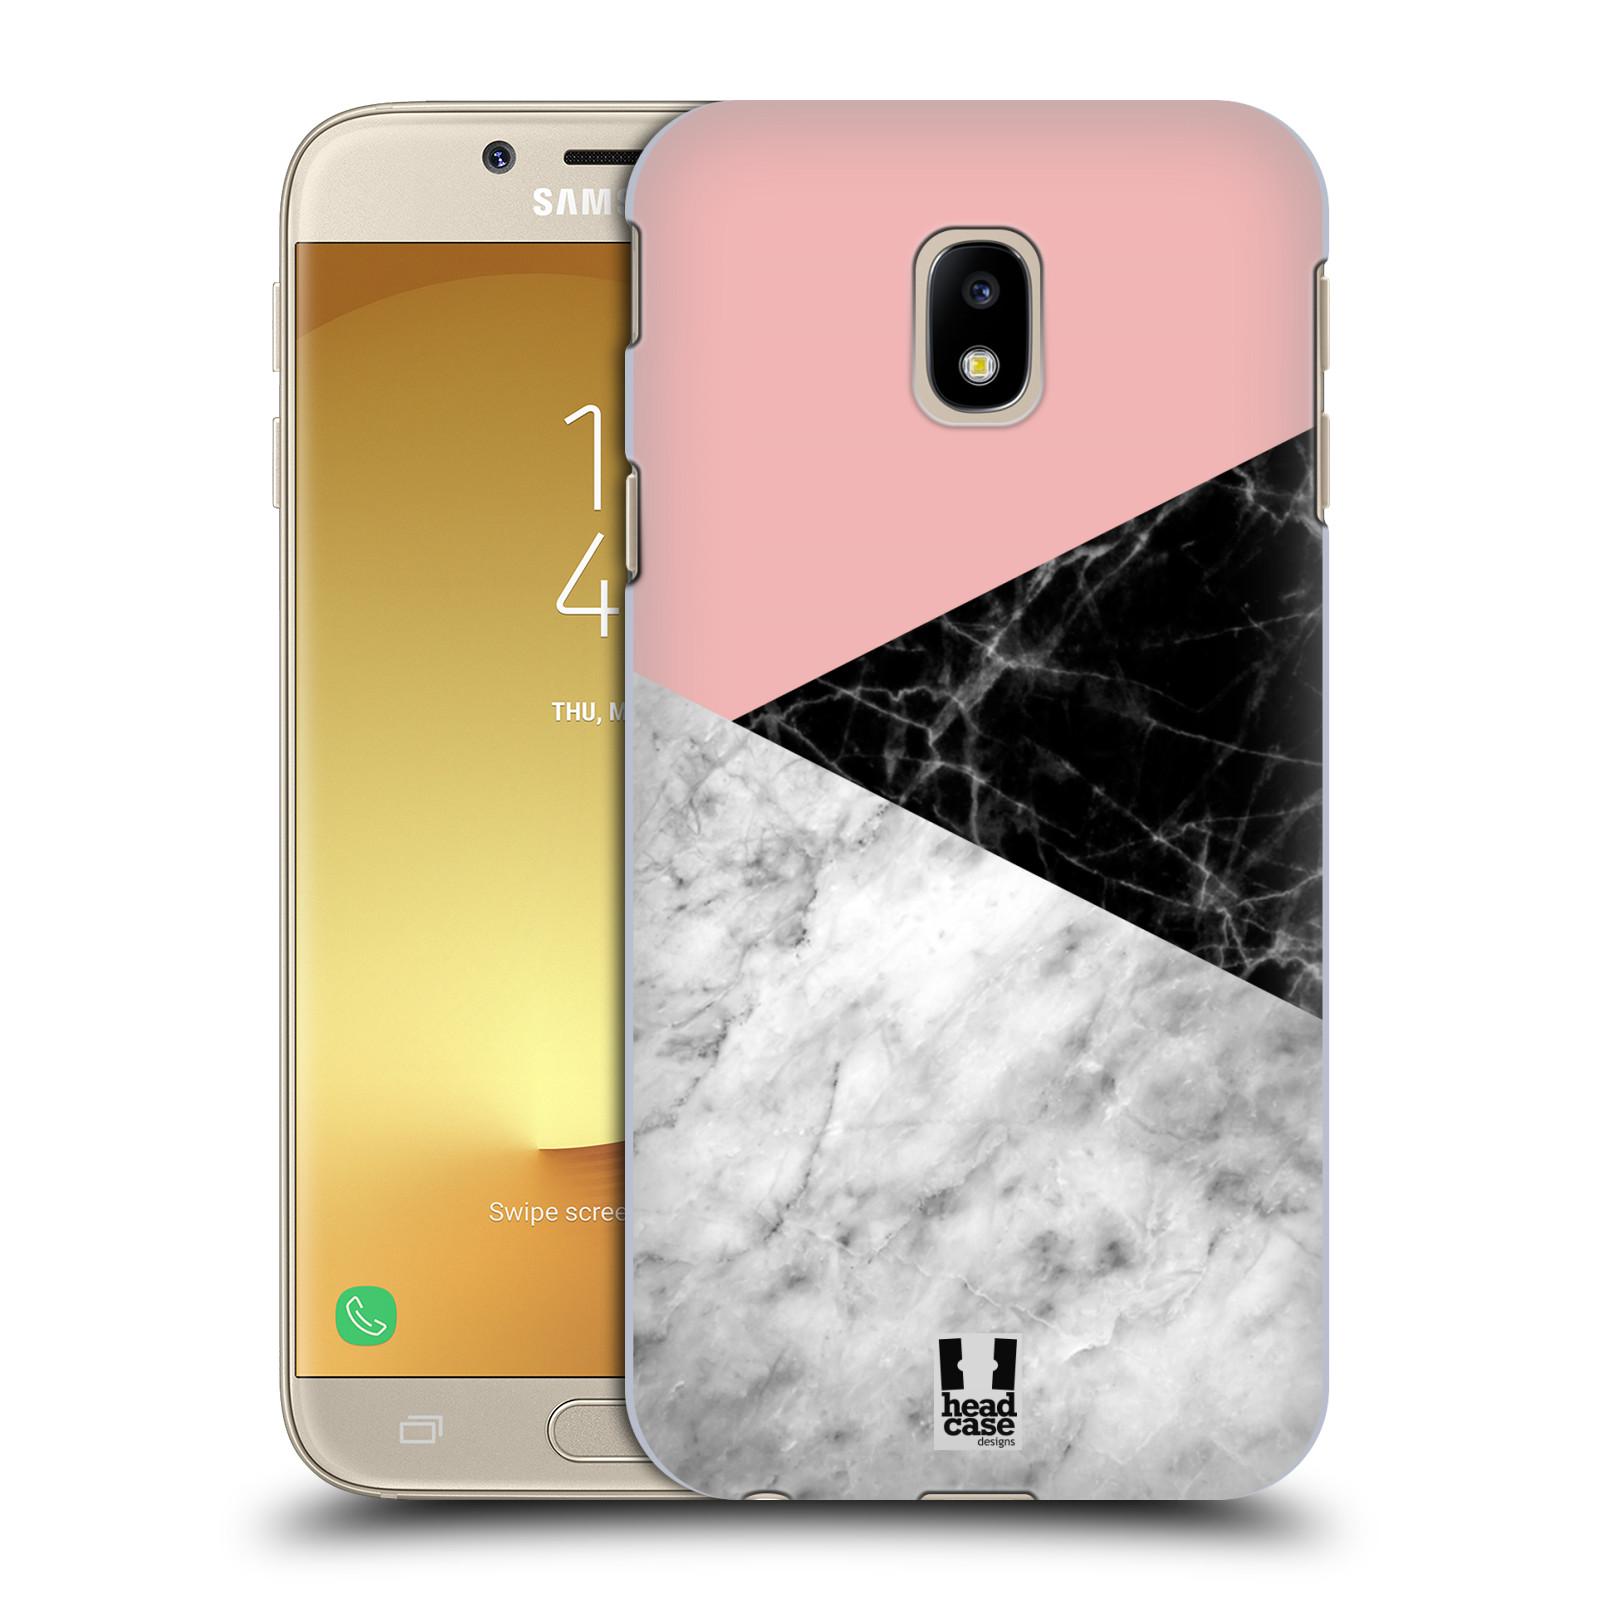 Plastové pouzdro na mobil Samsung Galaxy J3 (2017) - Head Case - Mramor mix